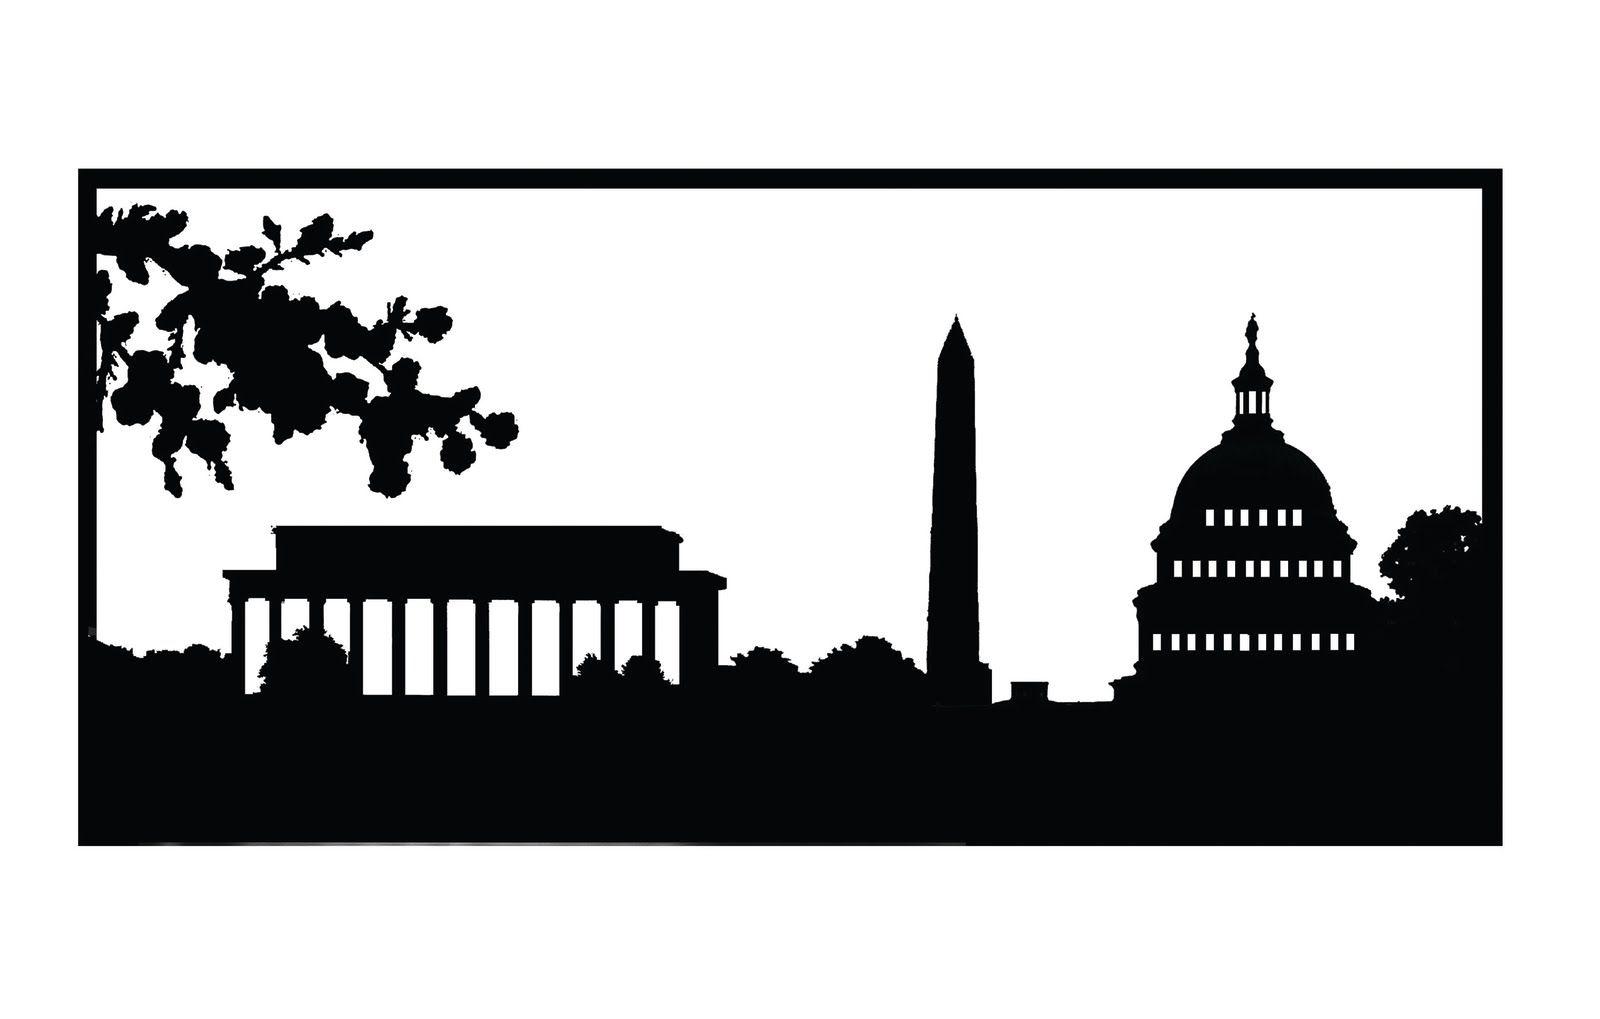 Dc skyline clipart graphic transparent download Washington, DC | SVG / Die Cutting | Skyline painting, Washington dc ... graphic transparent download